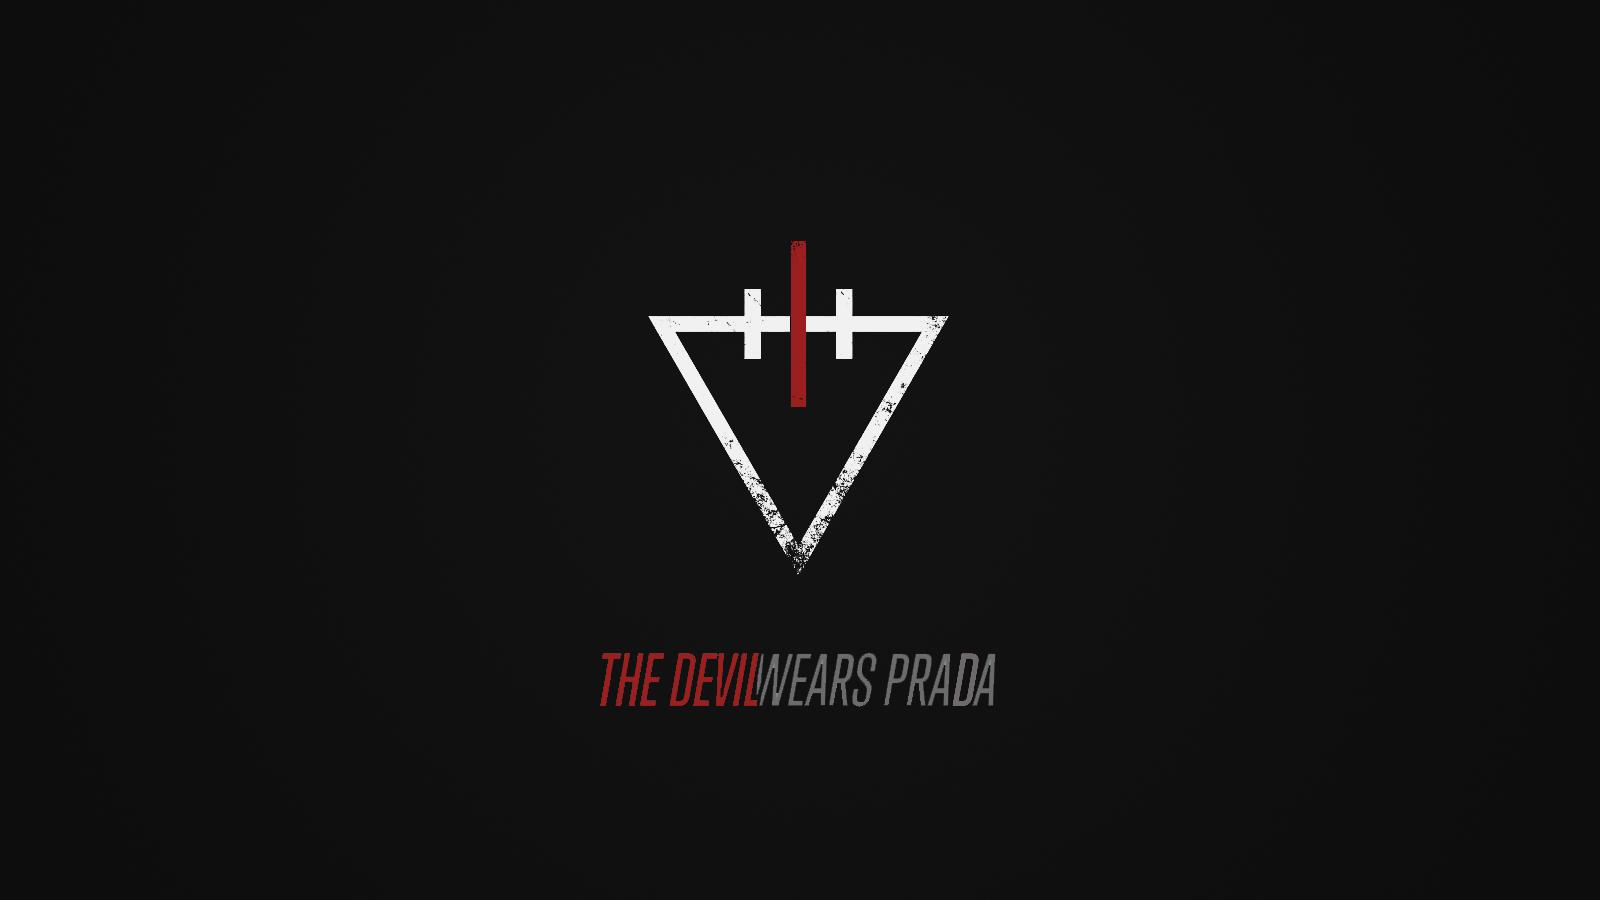 the devil wears prada wallpaper x | hd wallpapers | pinterest